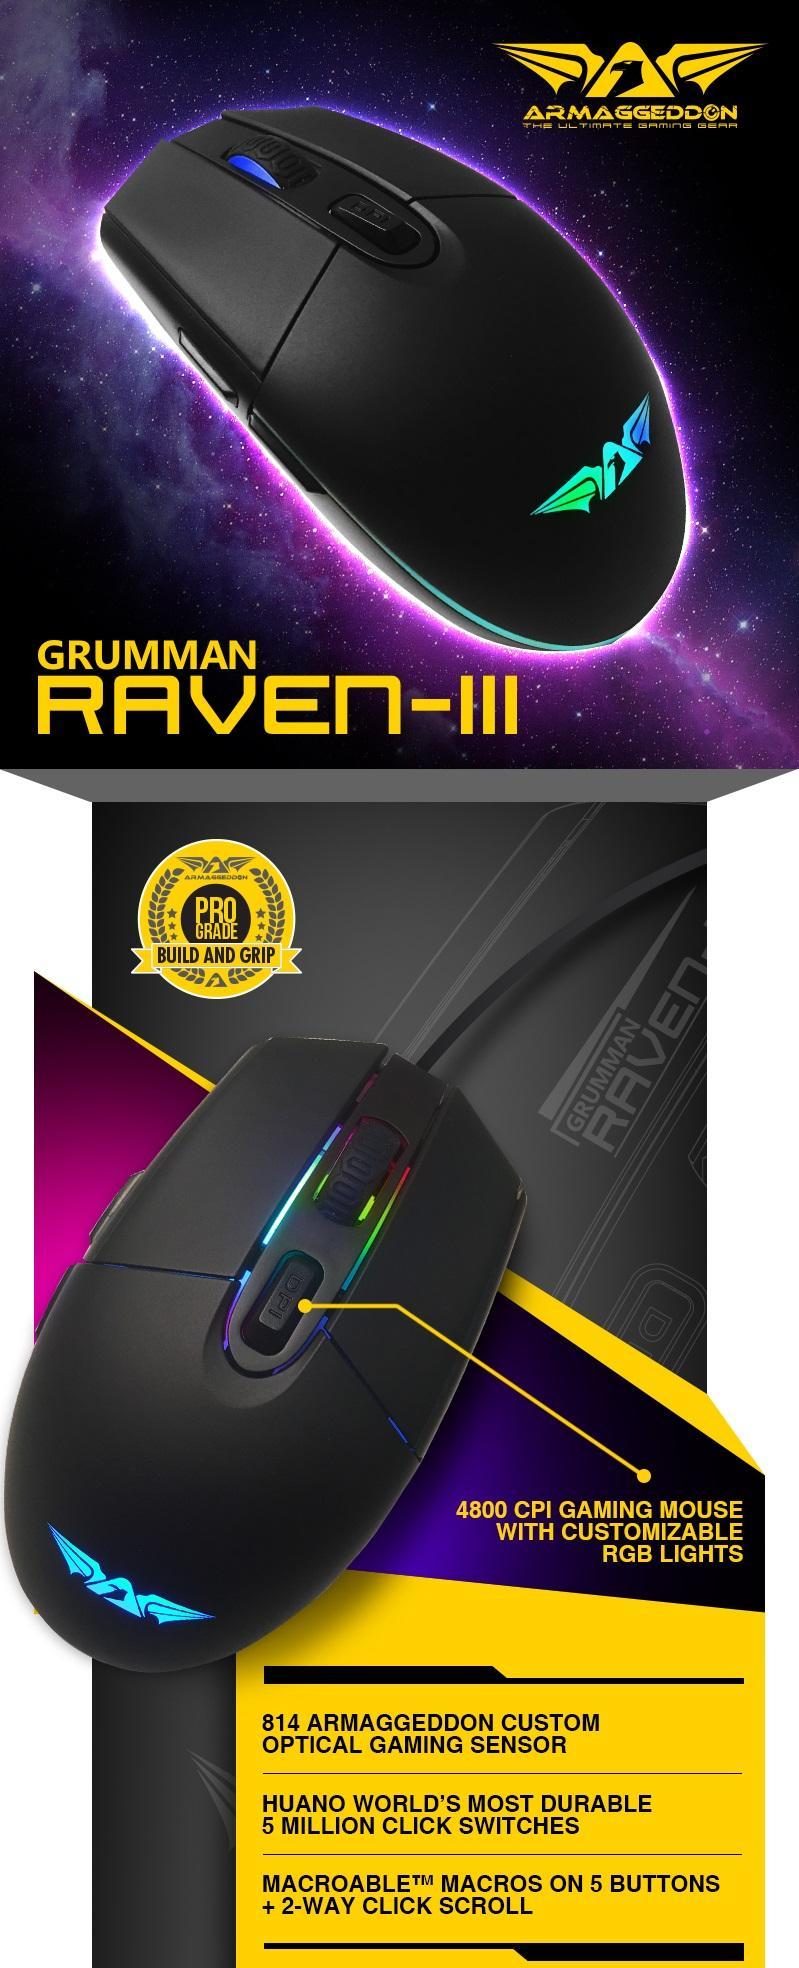 Armaggeddon Gaming Bundle E Sports Pro Kitmouse Keyboard Mousemat Mka 3c Psychfalcon Edm Raven Iii 01